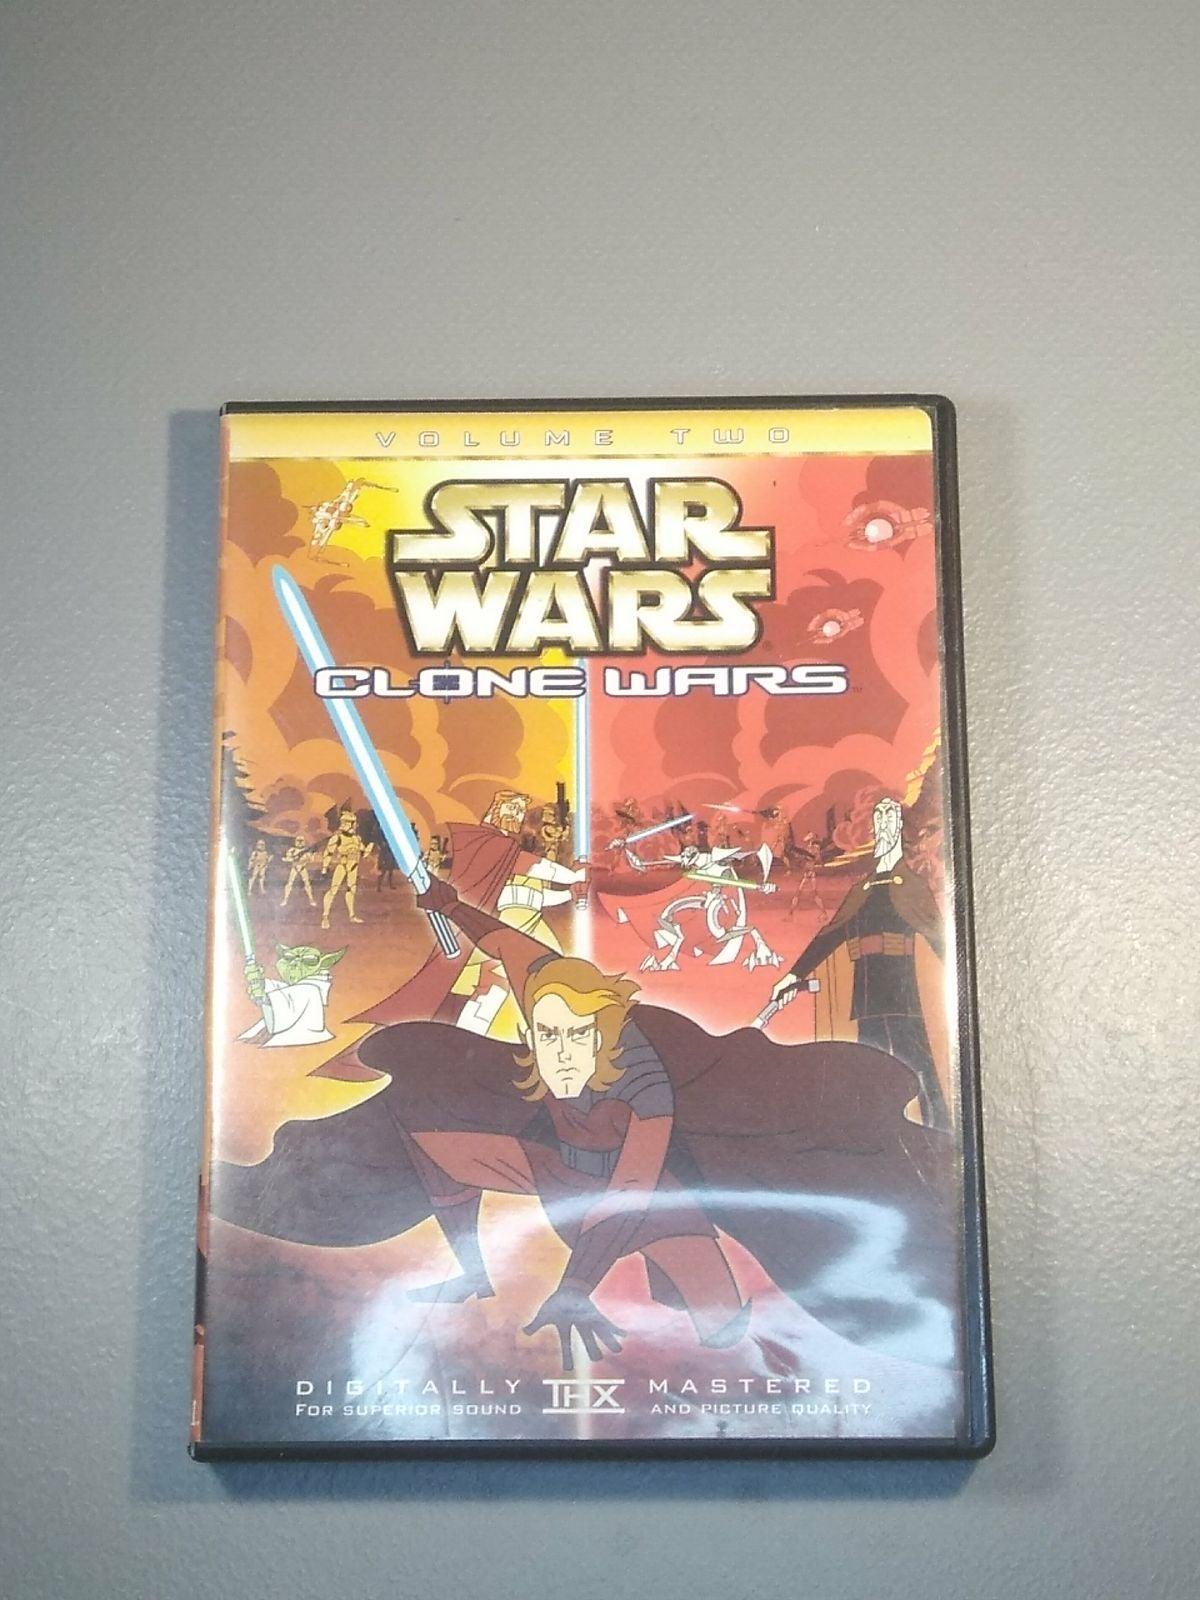 Star Wars: Clone Wars Volume Two DVD